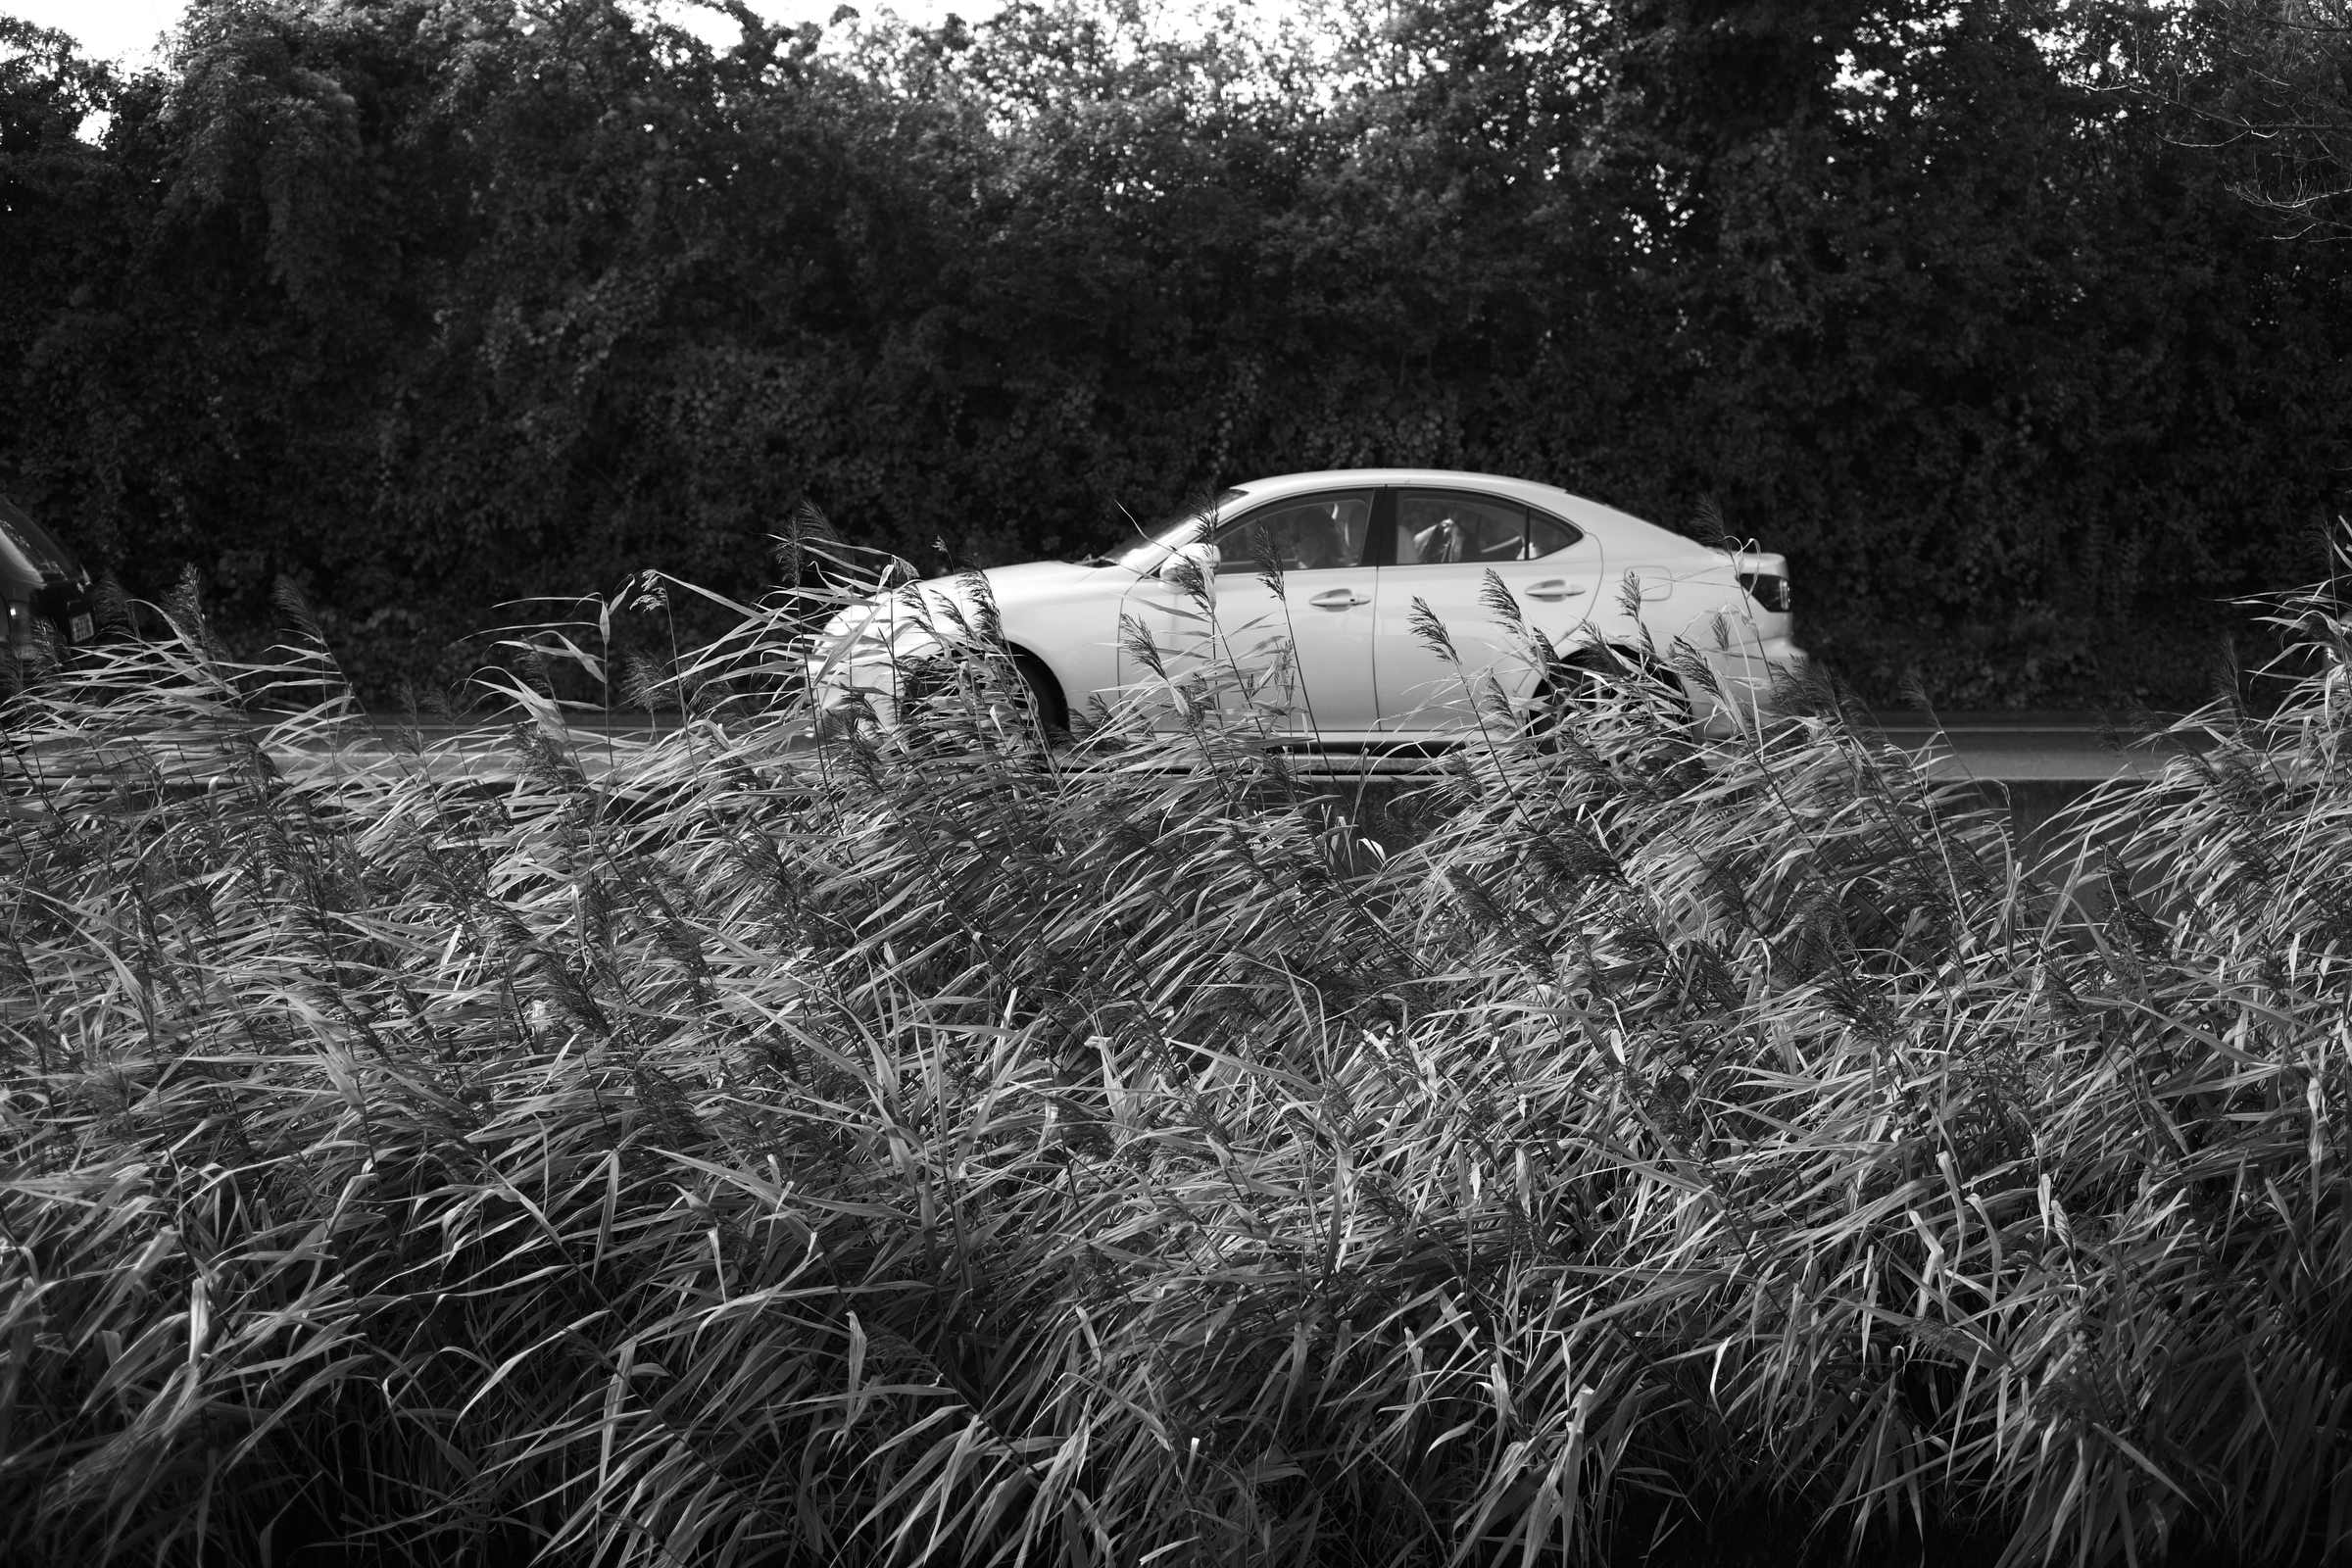 car-black-and-white.jpg